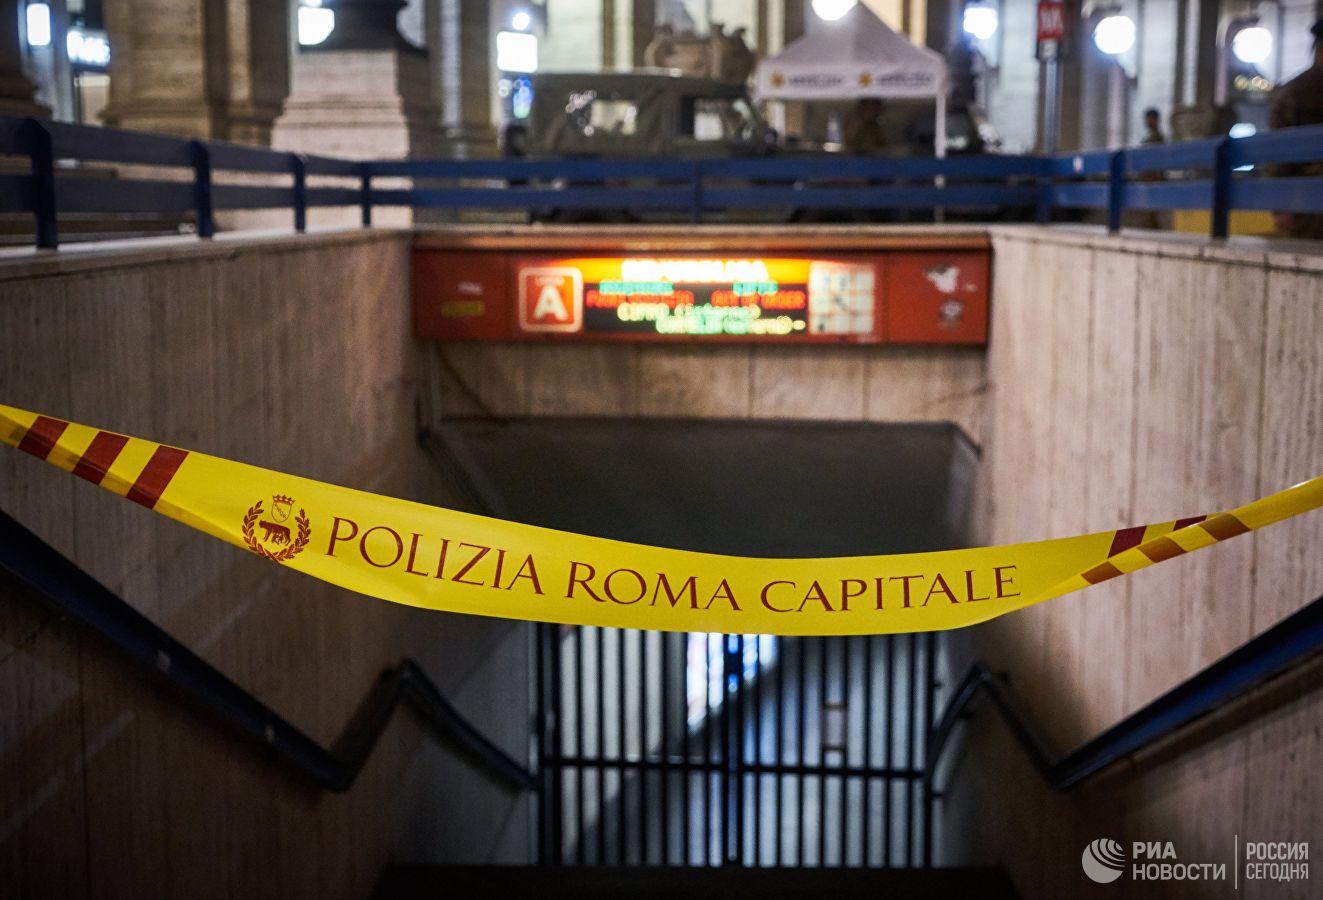 © РИА Новости / Данило Гарчиа Ди Мео